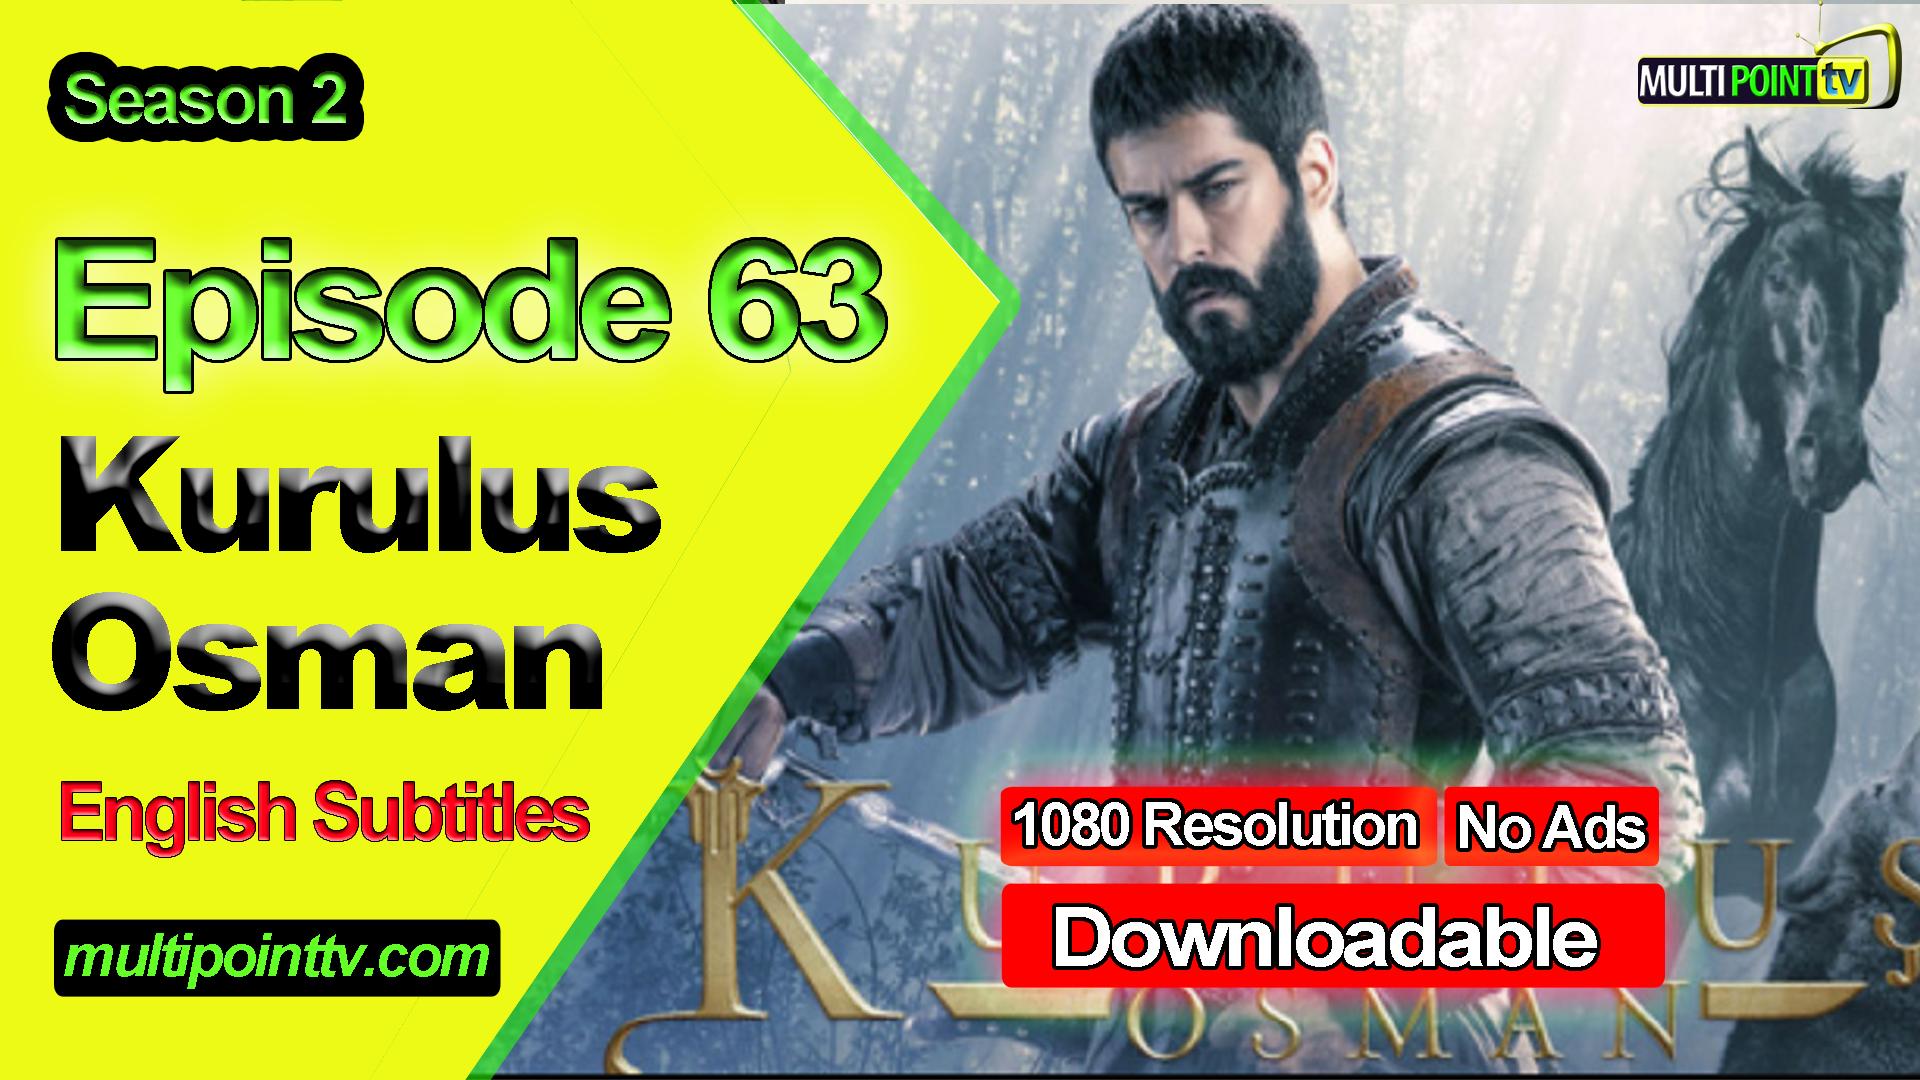 Kurulus Osman Episode 63 English Subtitles